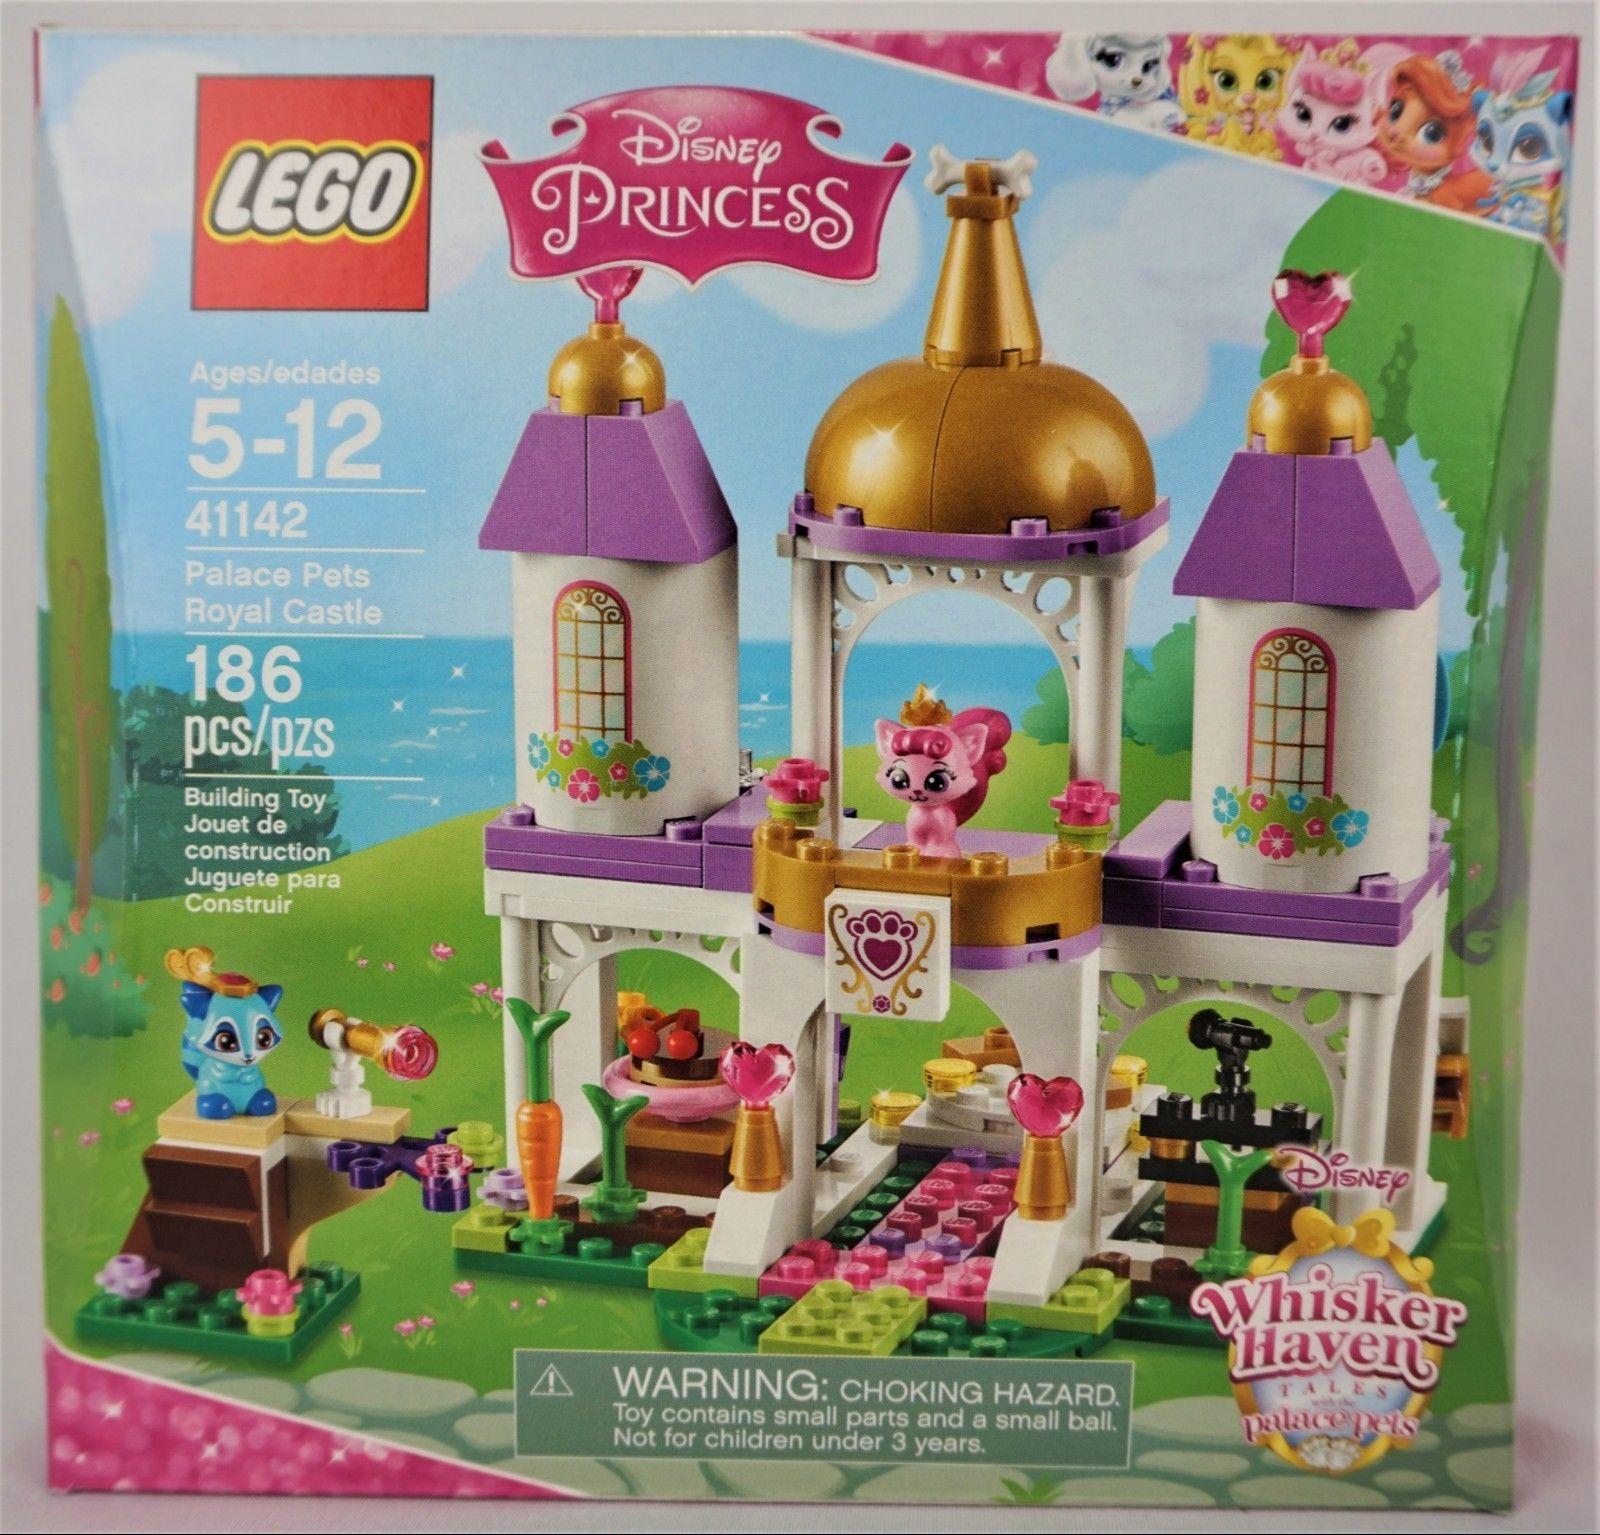 Lego Disney Princess 41142 Palace Pets Royal Castle [New] Building Set